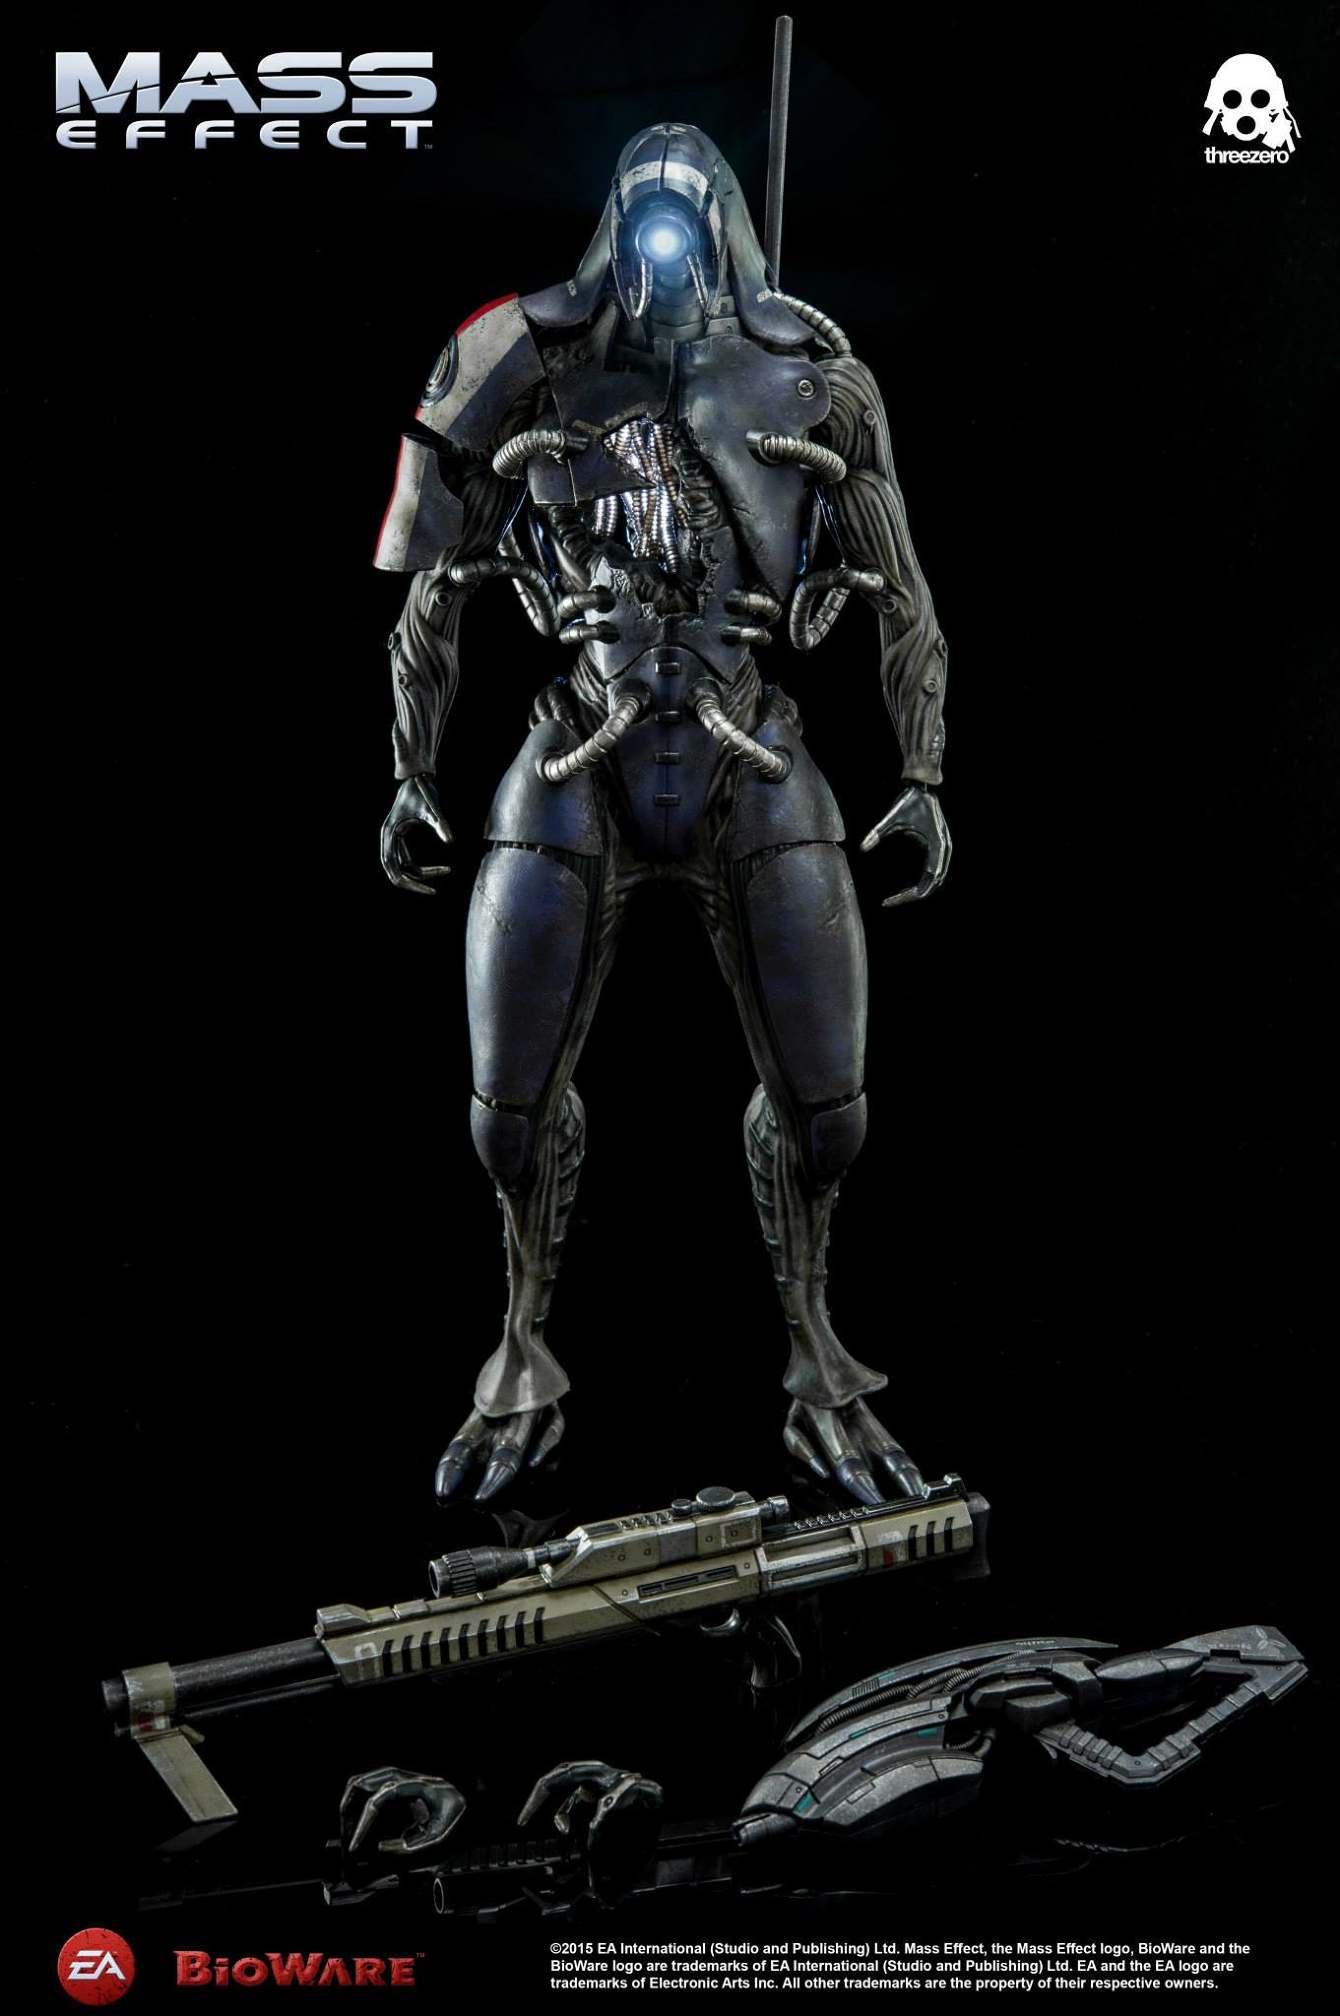 ThreeZero-Bioware-video-game-Legion-Mass-Effect-figure-18_1340_c.jpg